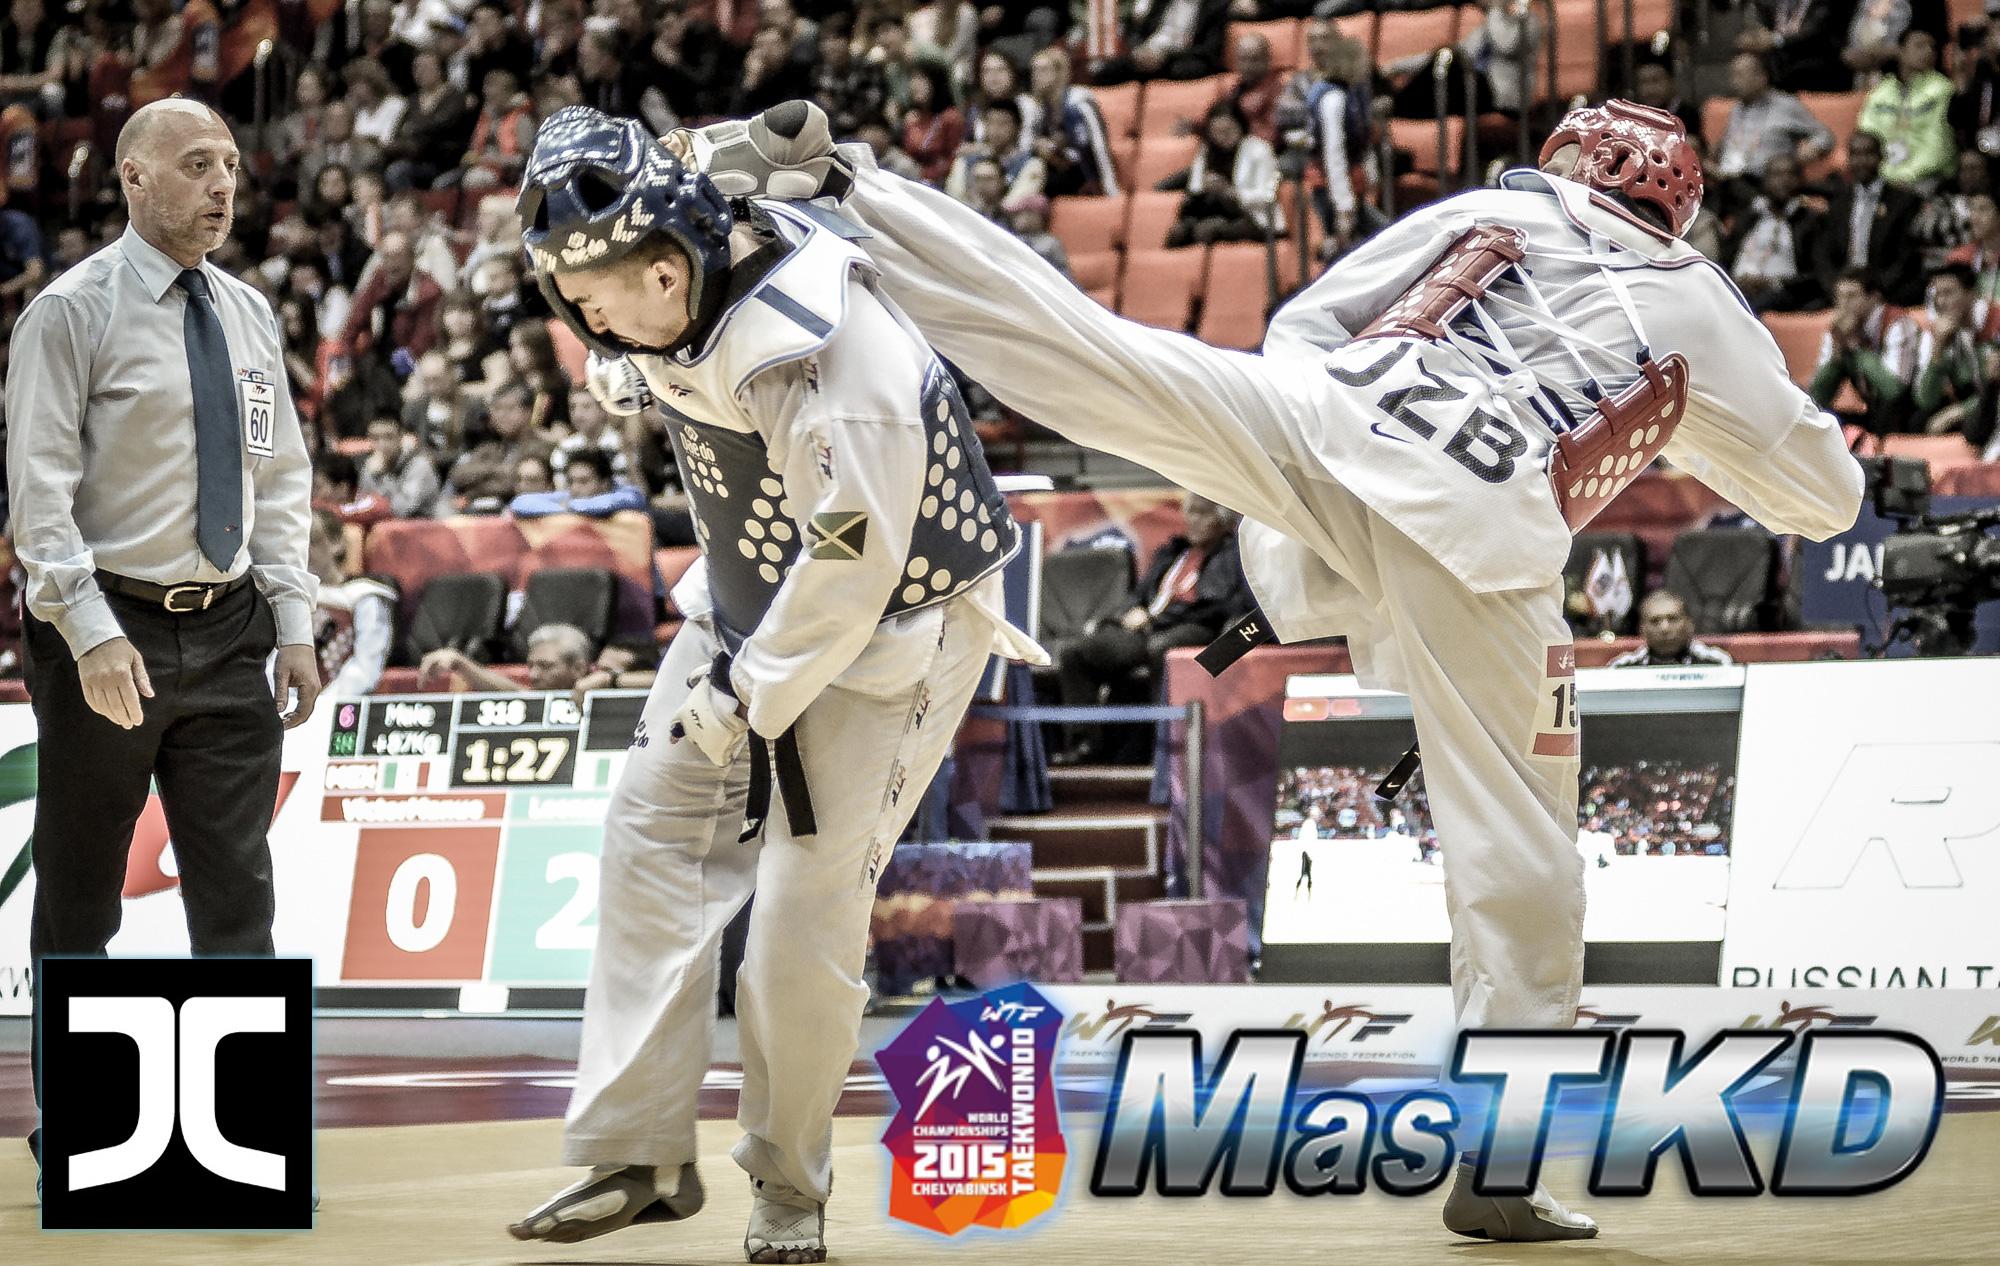 03_JCalicu-Mejores-imagenes-del-Mundial-de-Taekwondo_d5